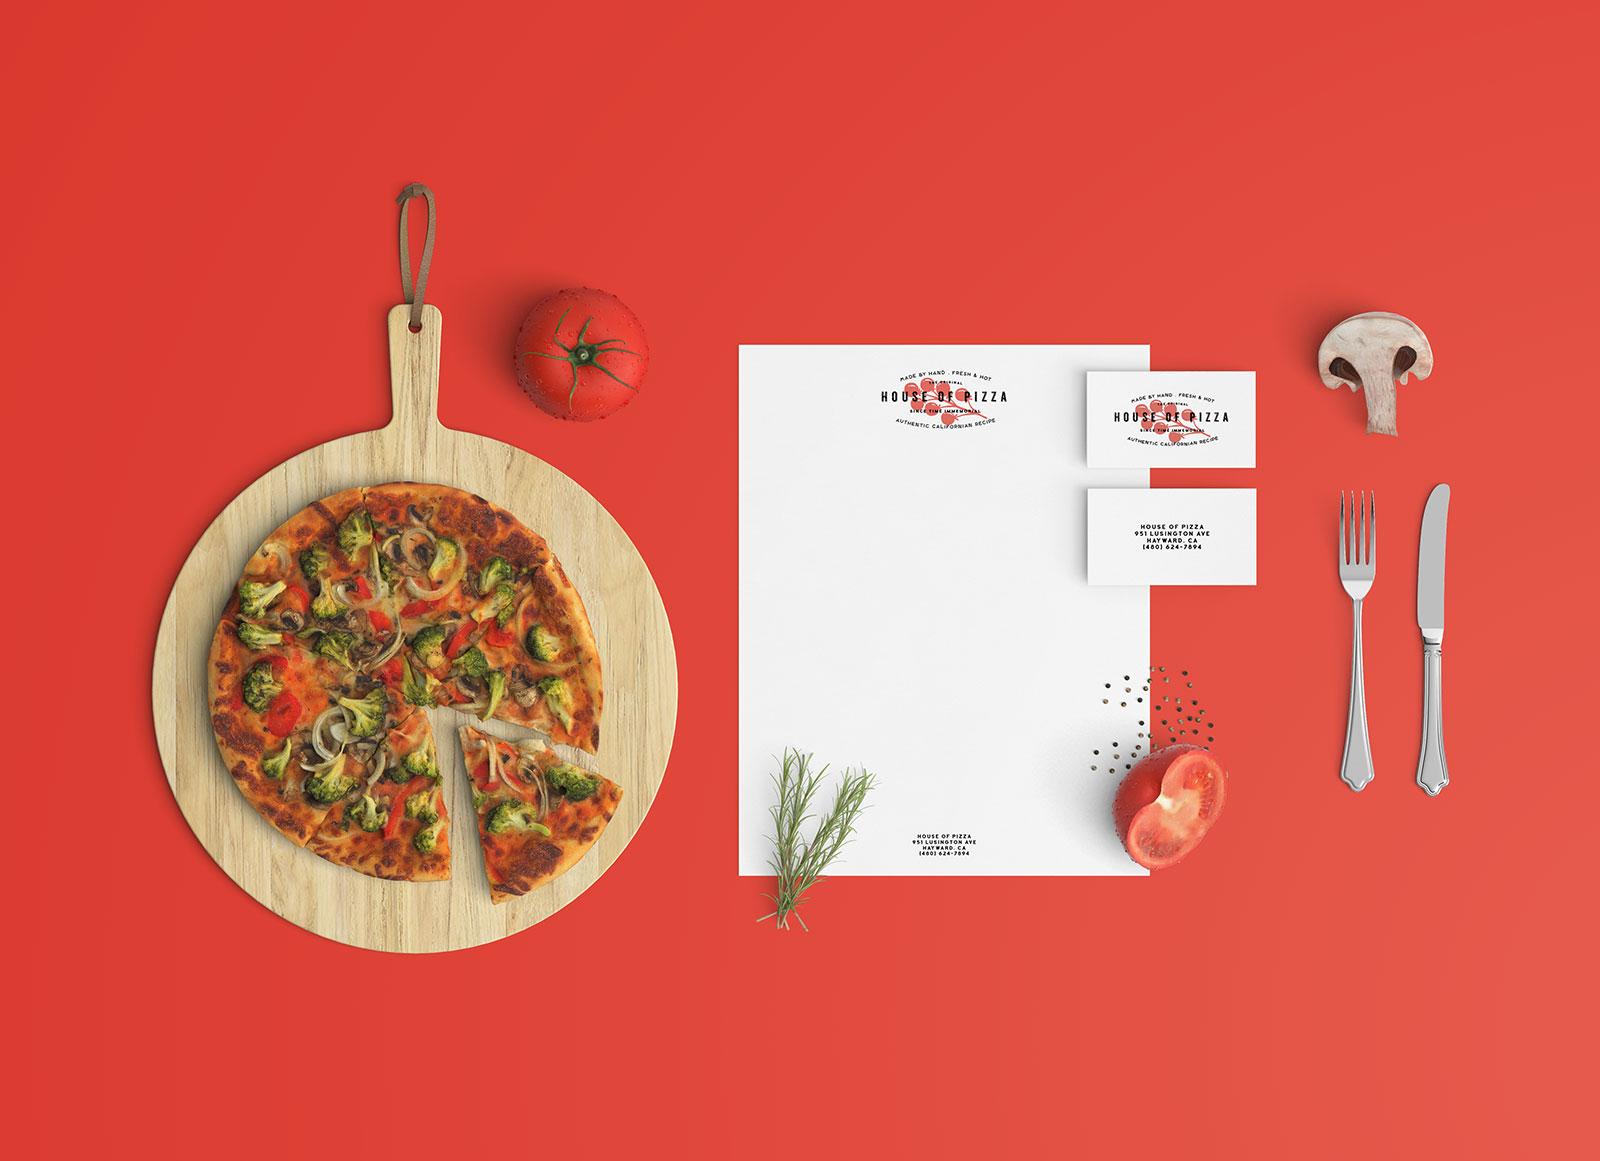 Free-Premium-Restaurant-Stationery-Mockup-PSD